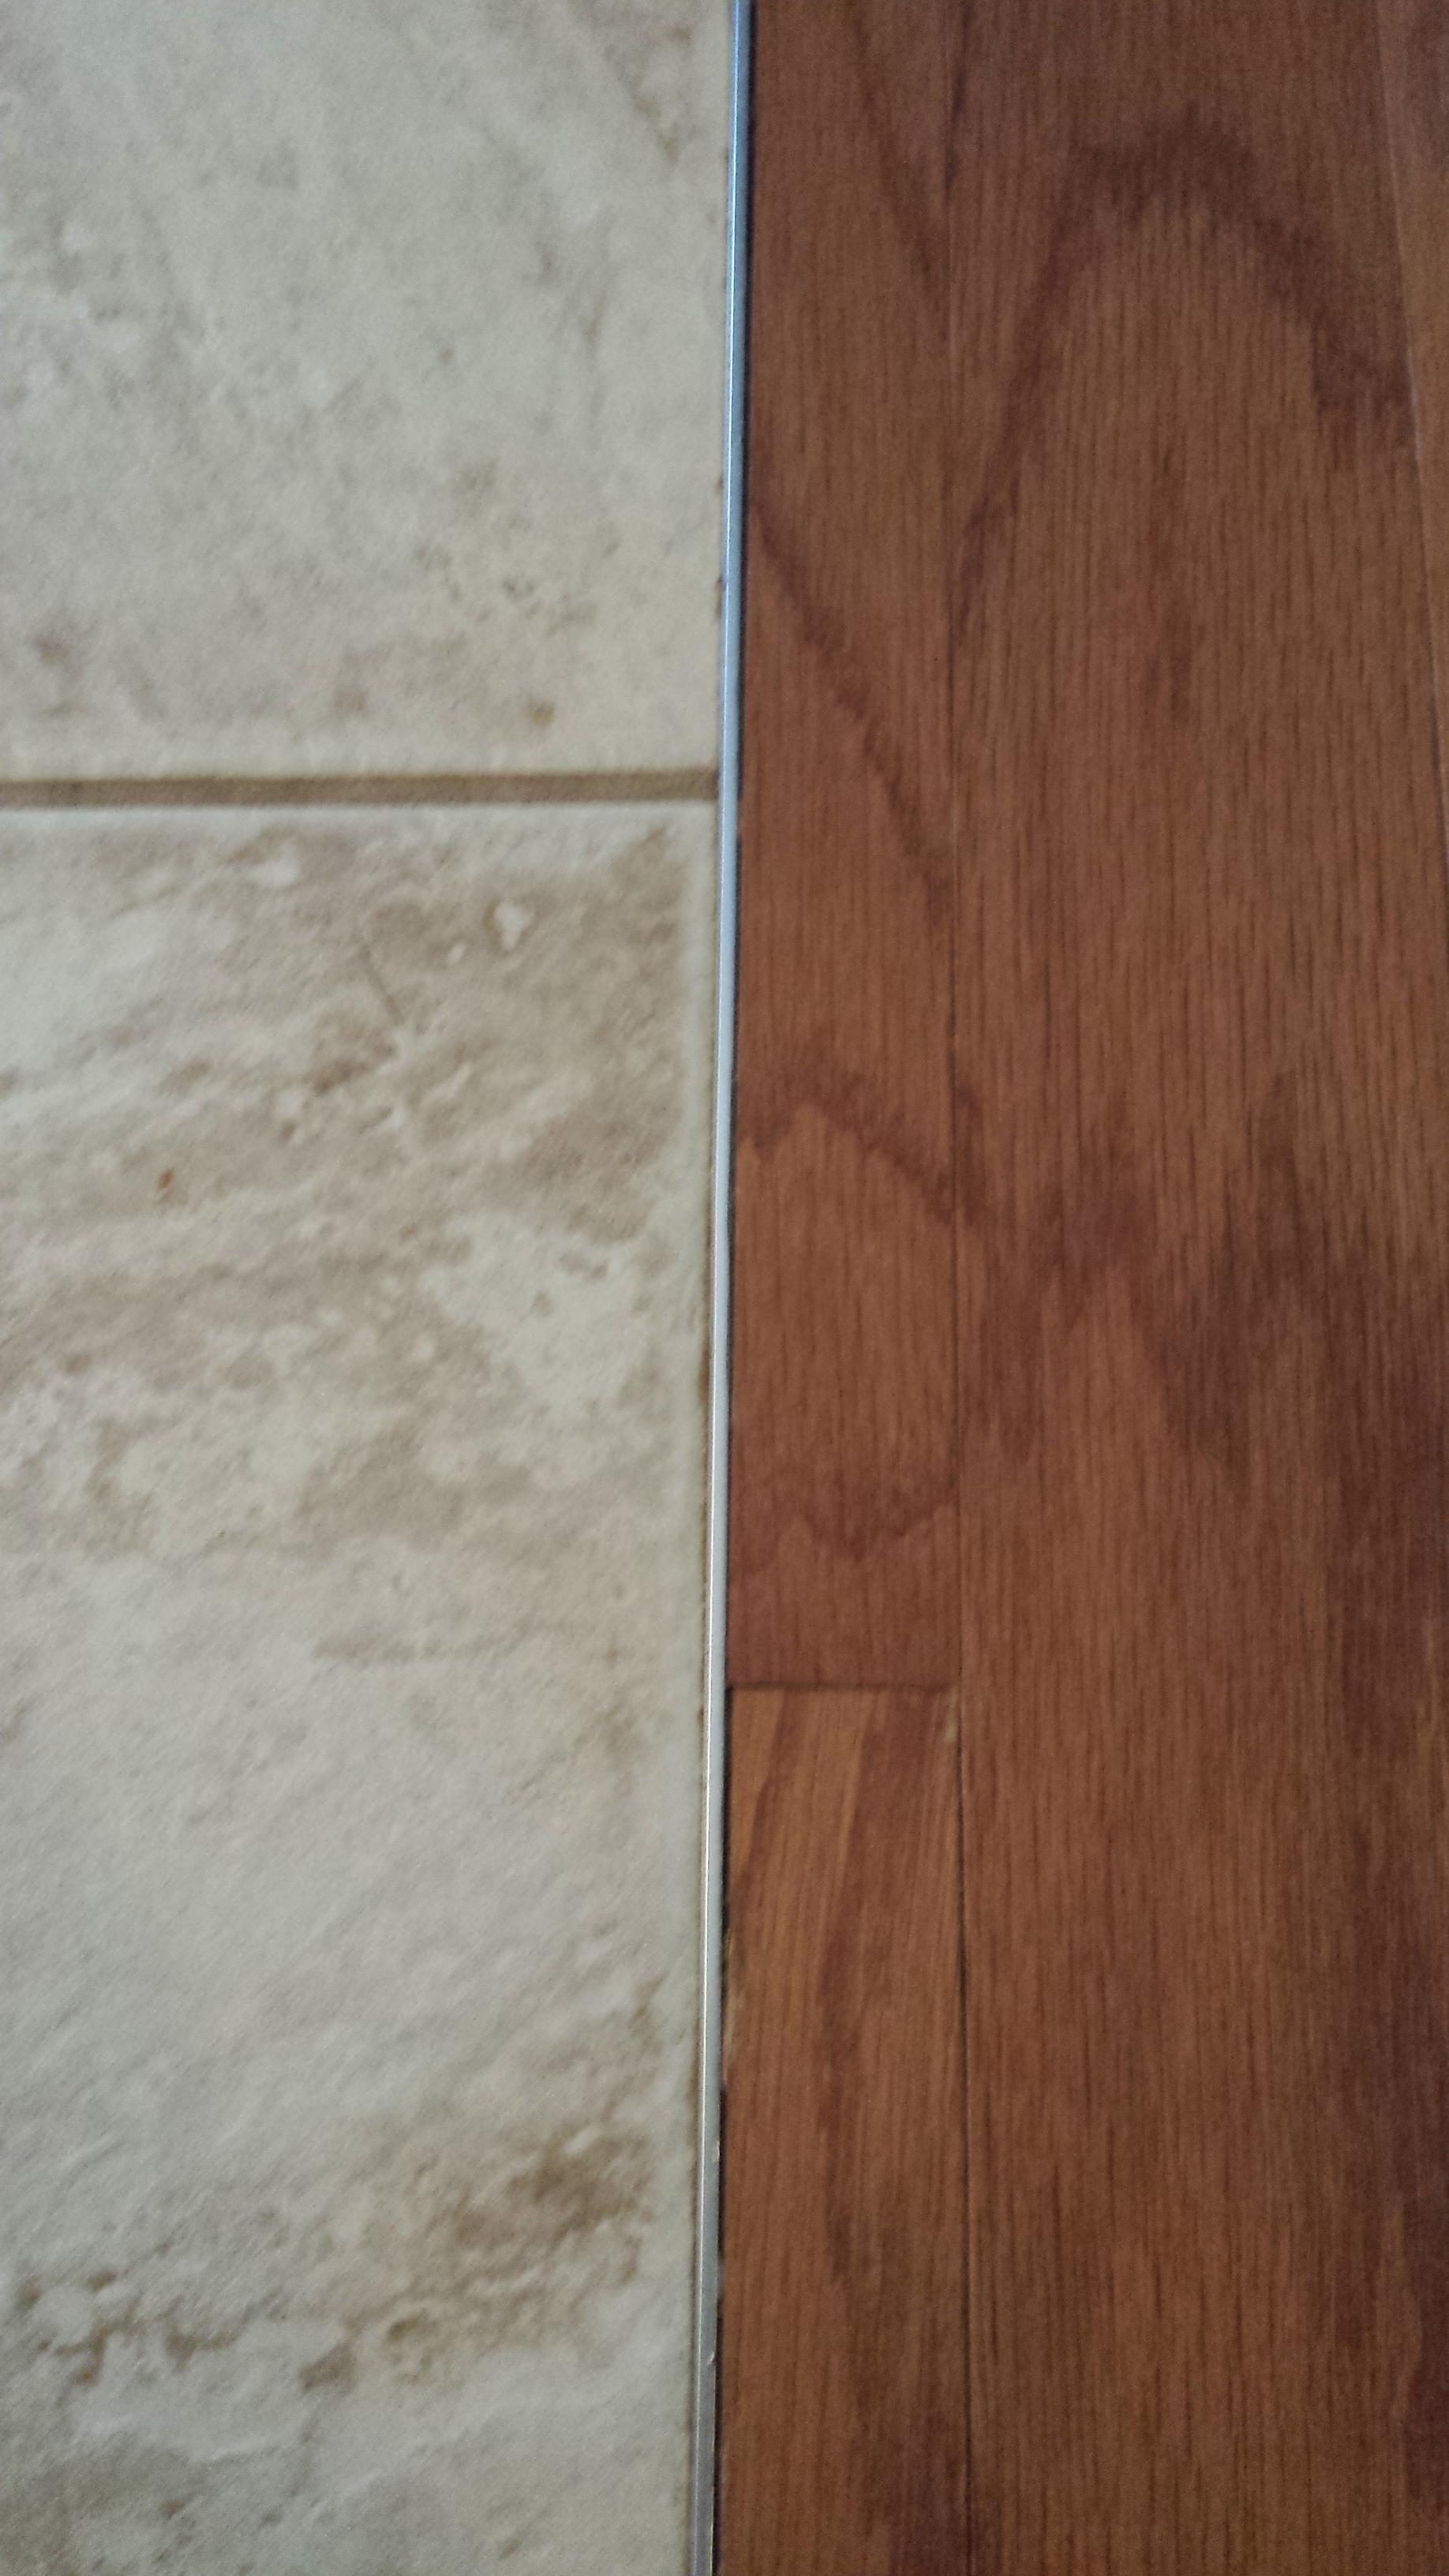 Floating Hardwood Floor Transition To Tile Floating Hardwood Floor Wood Laminate Flooring Floor Molding